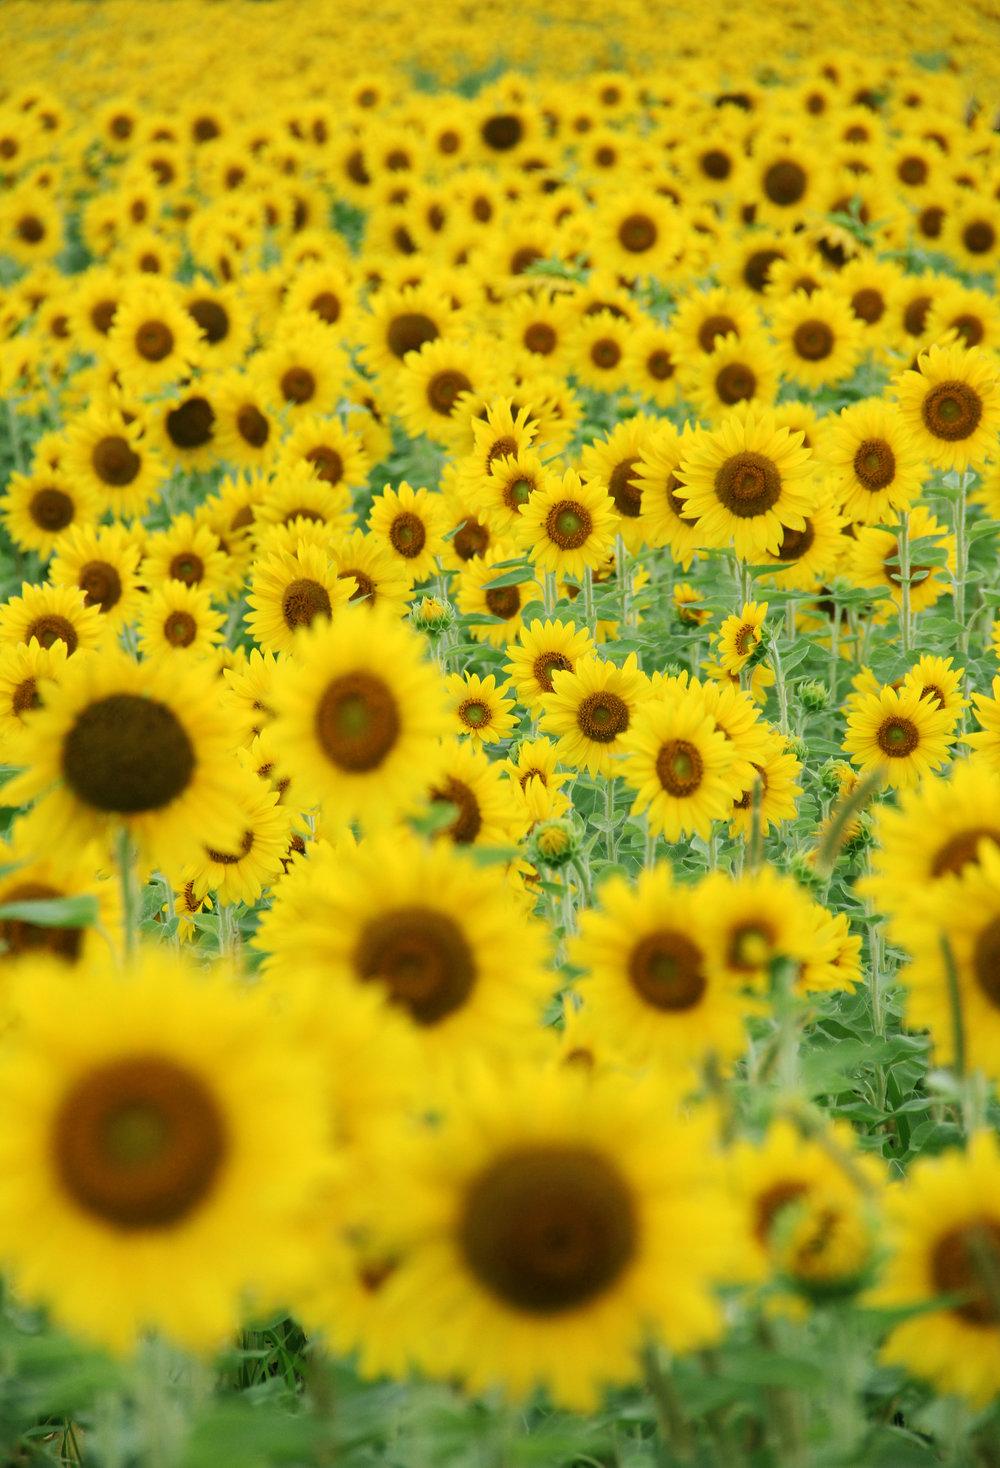 ohio sunflowers at cottell park ohio explored